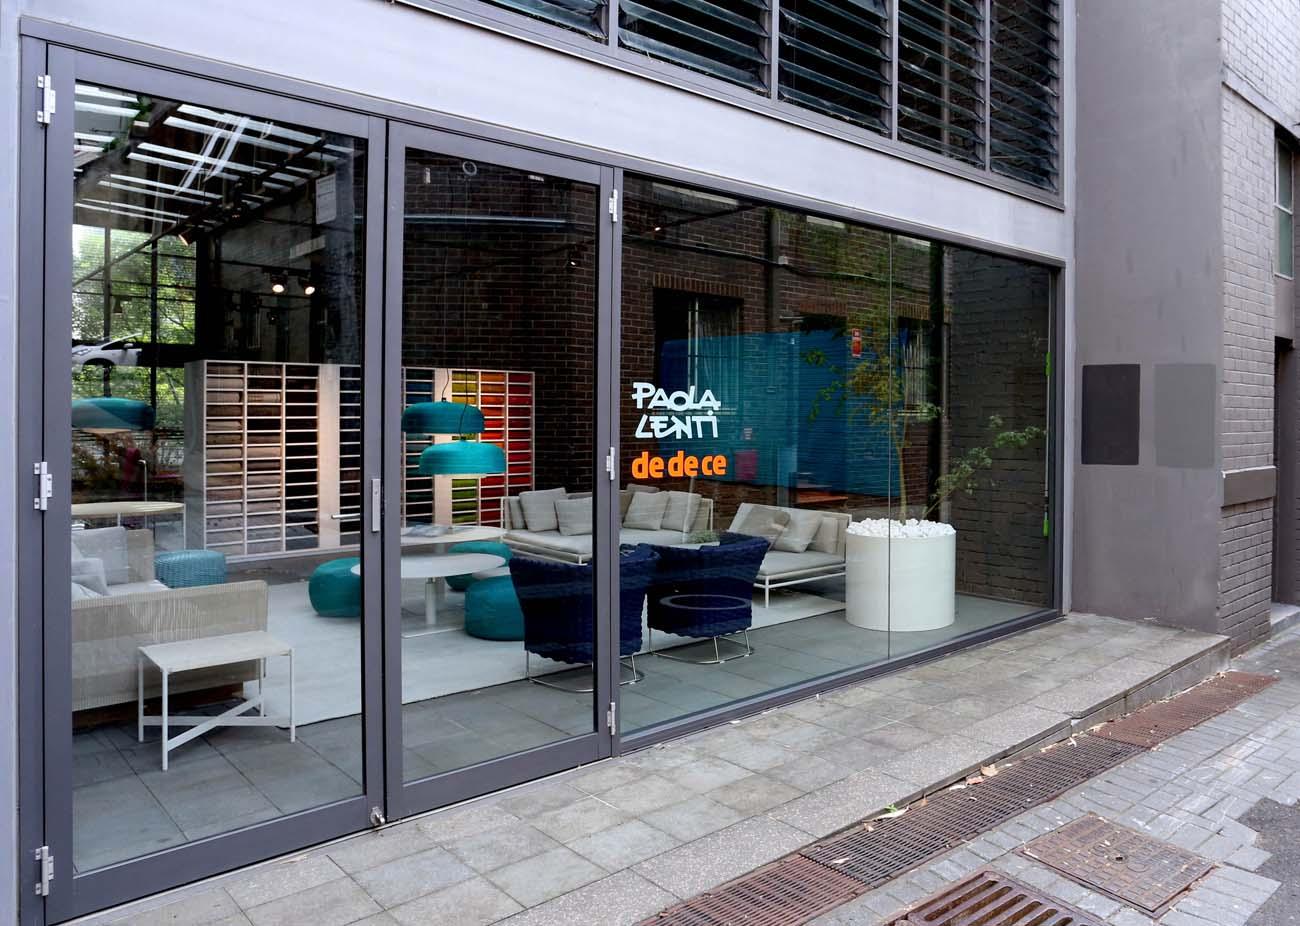 paolo lenti @ dedece atrium space sydney (1)